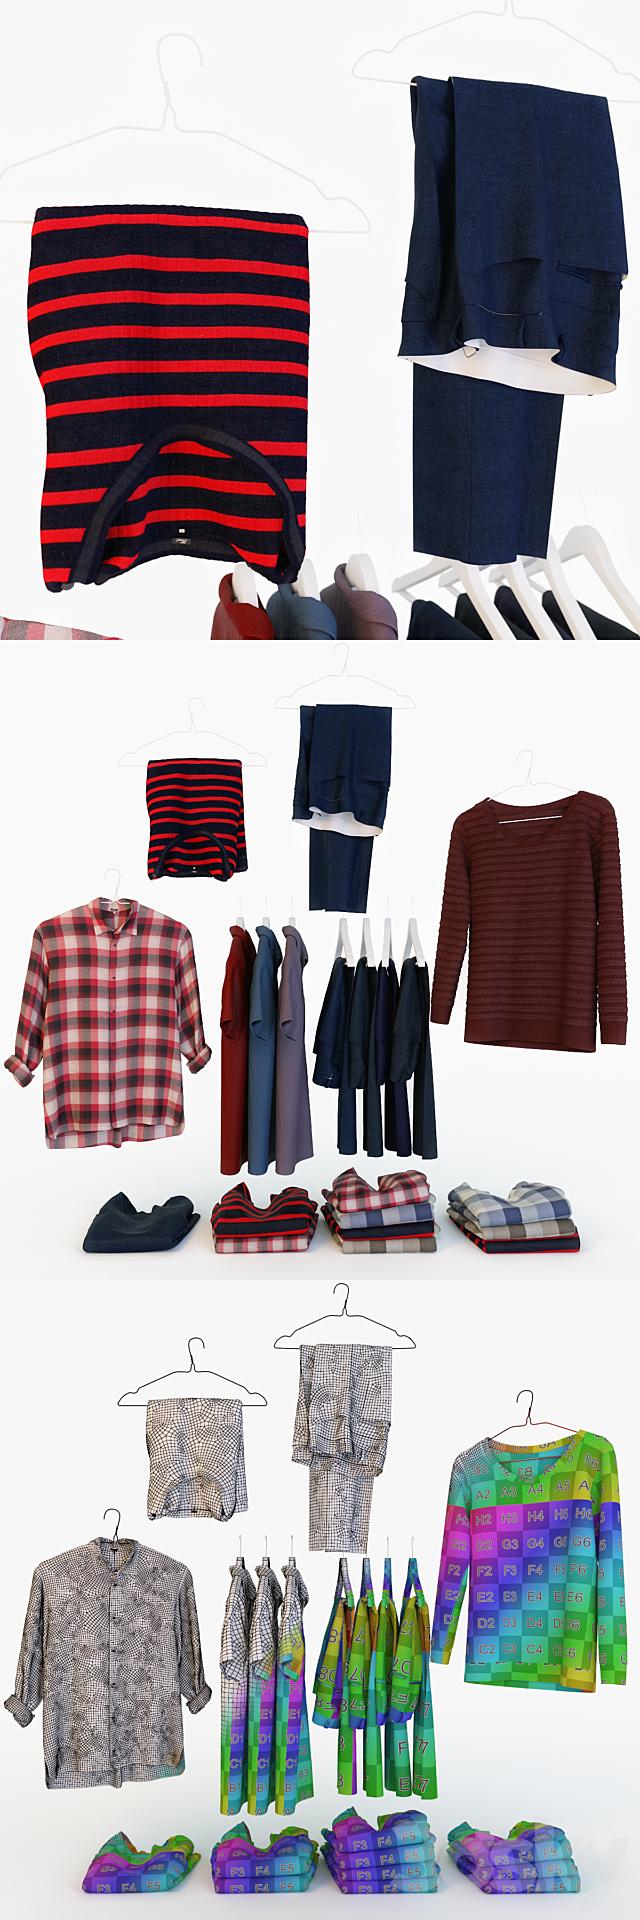 Men's wardrobe 2